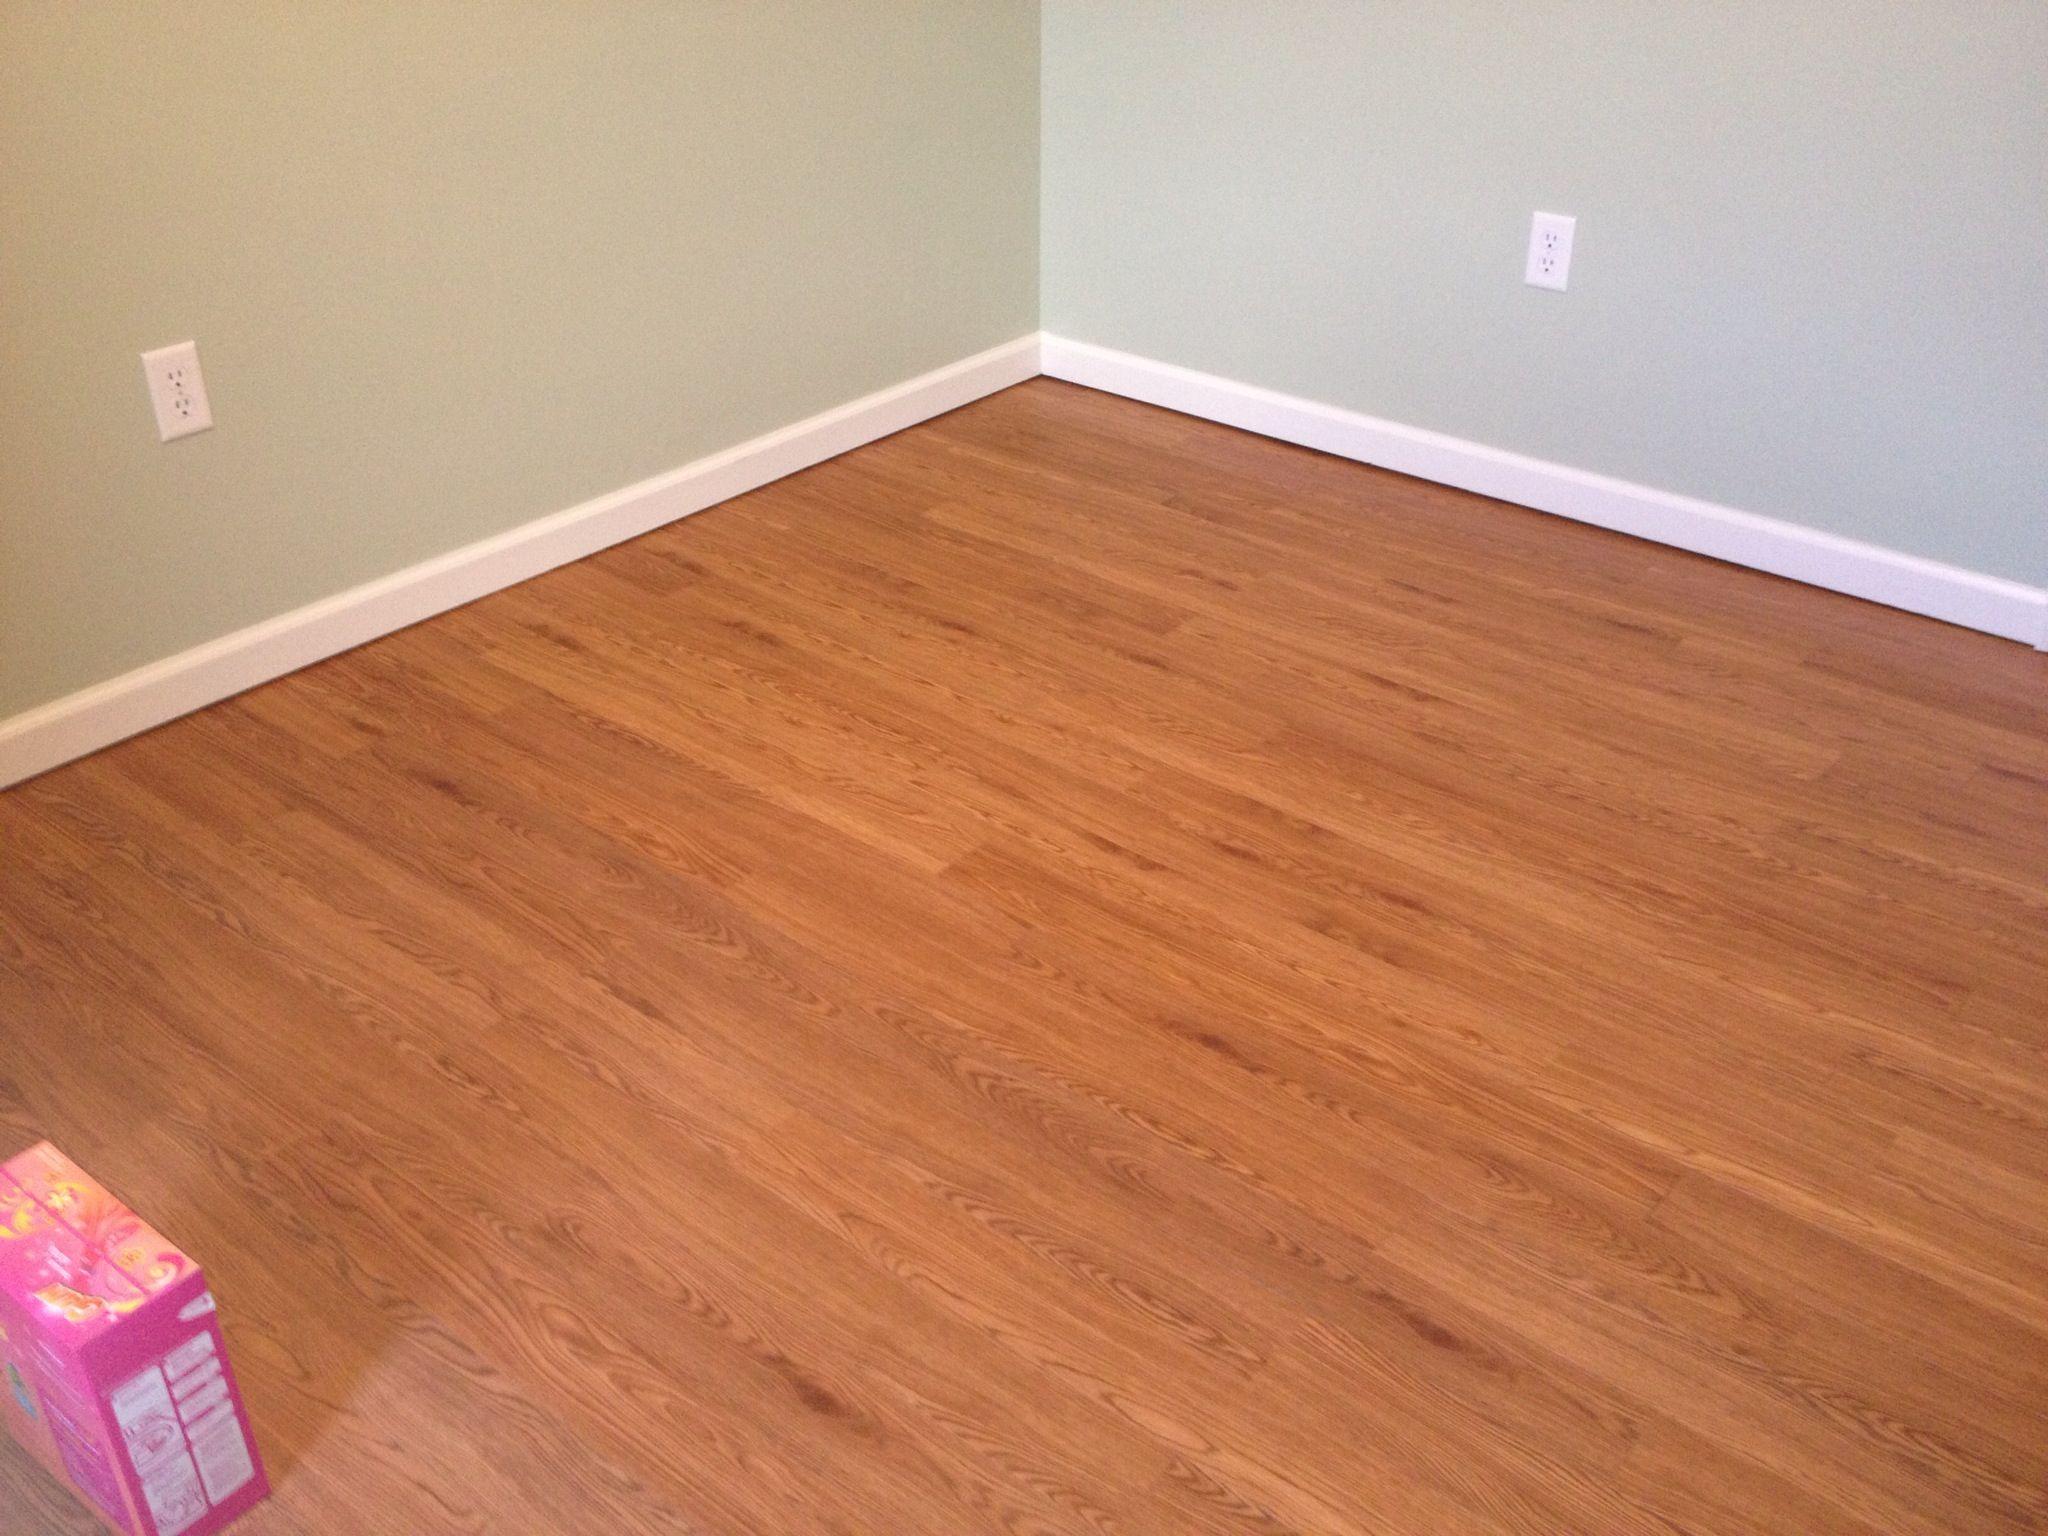 Vinyl plank flooring Looks and feels like real wood Super easy to